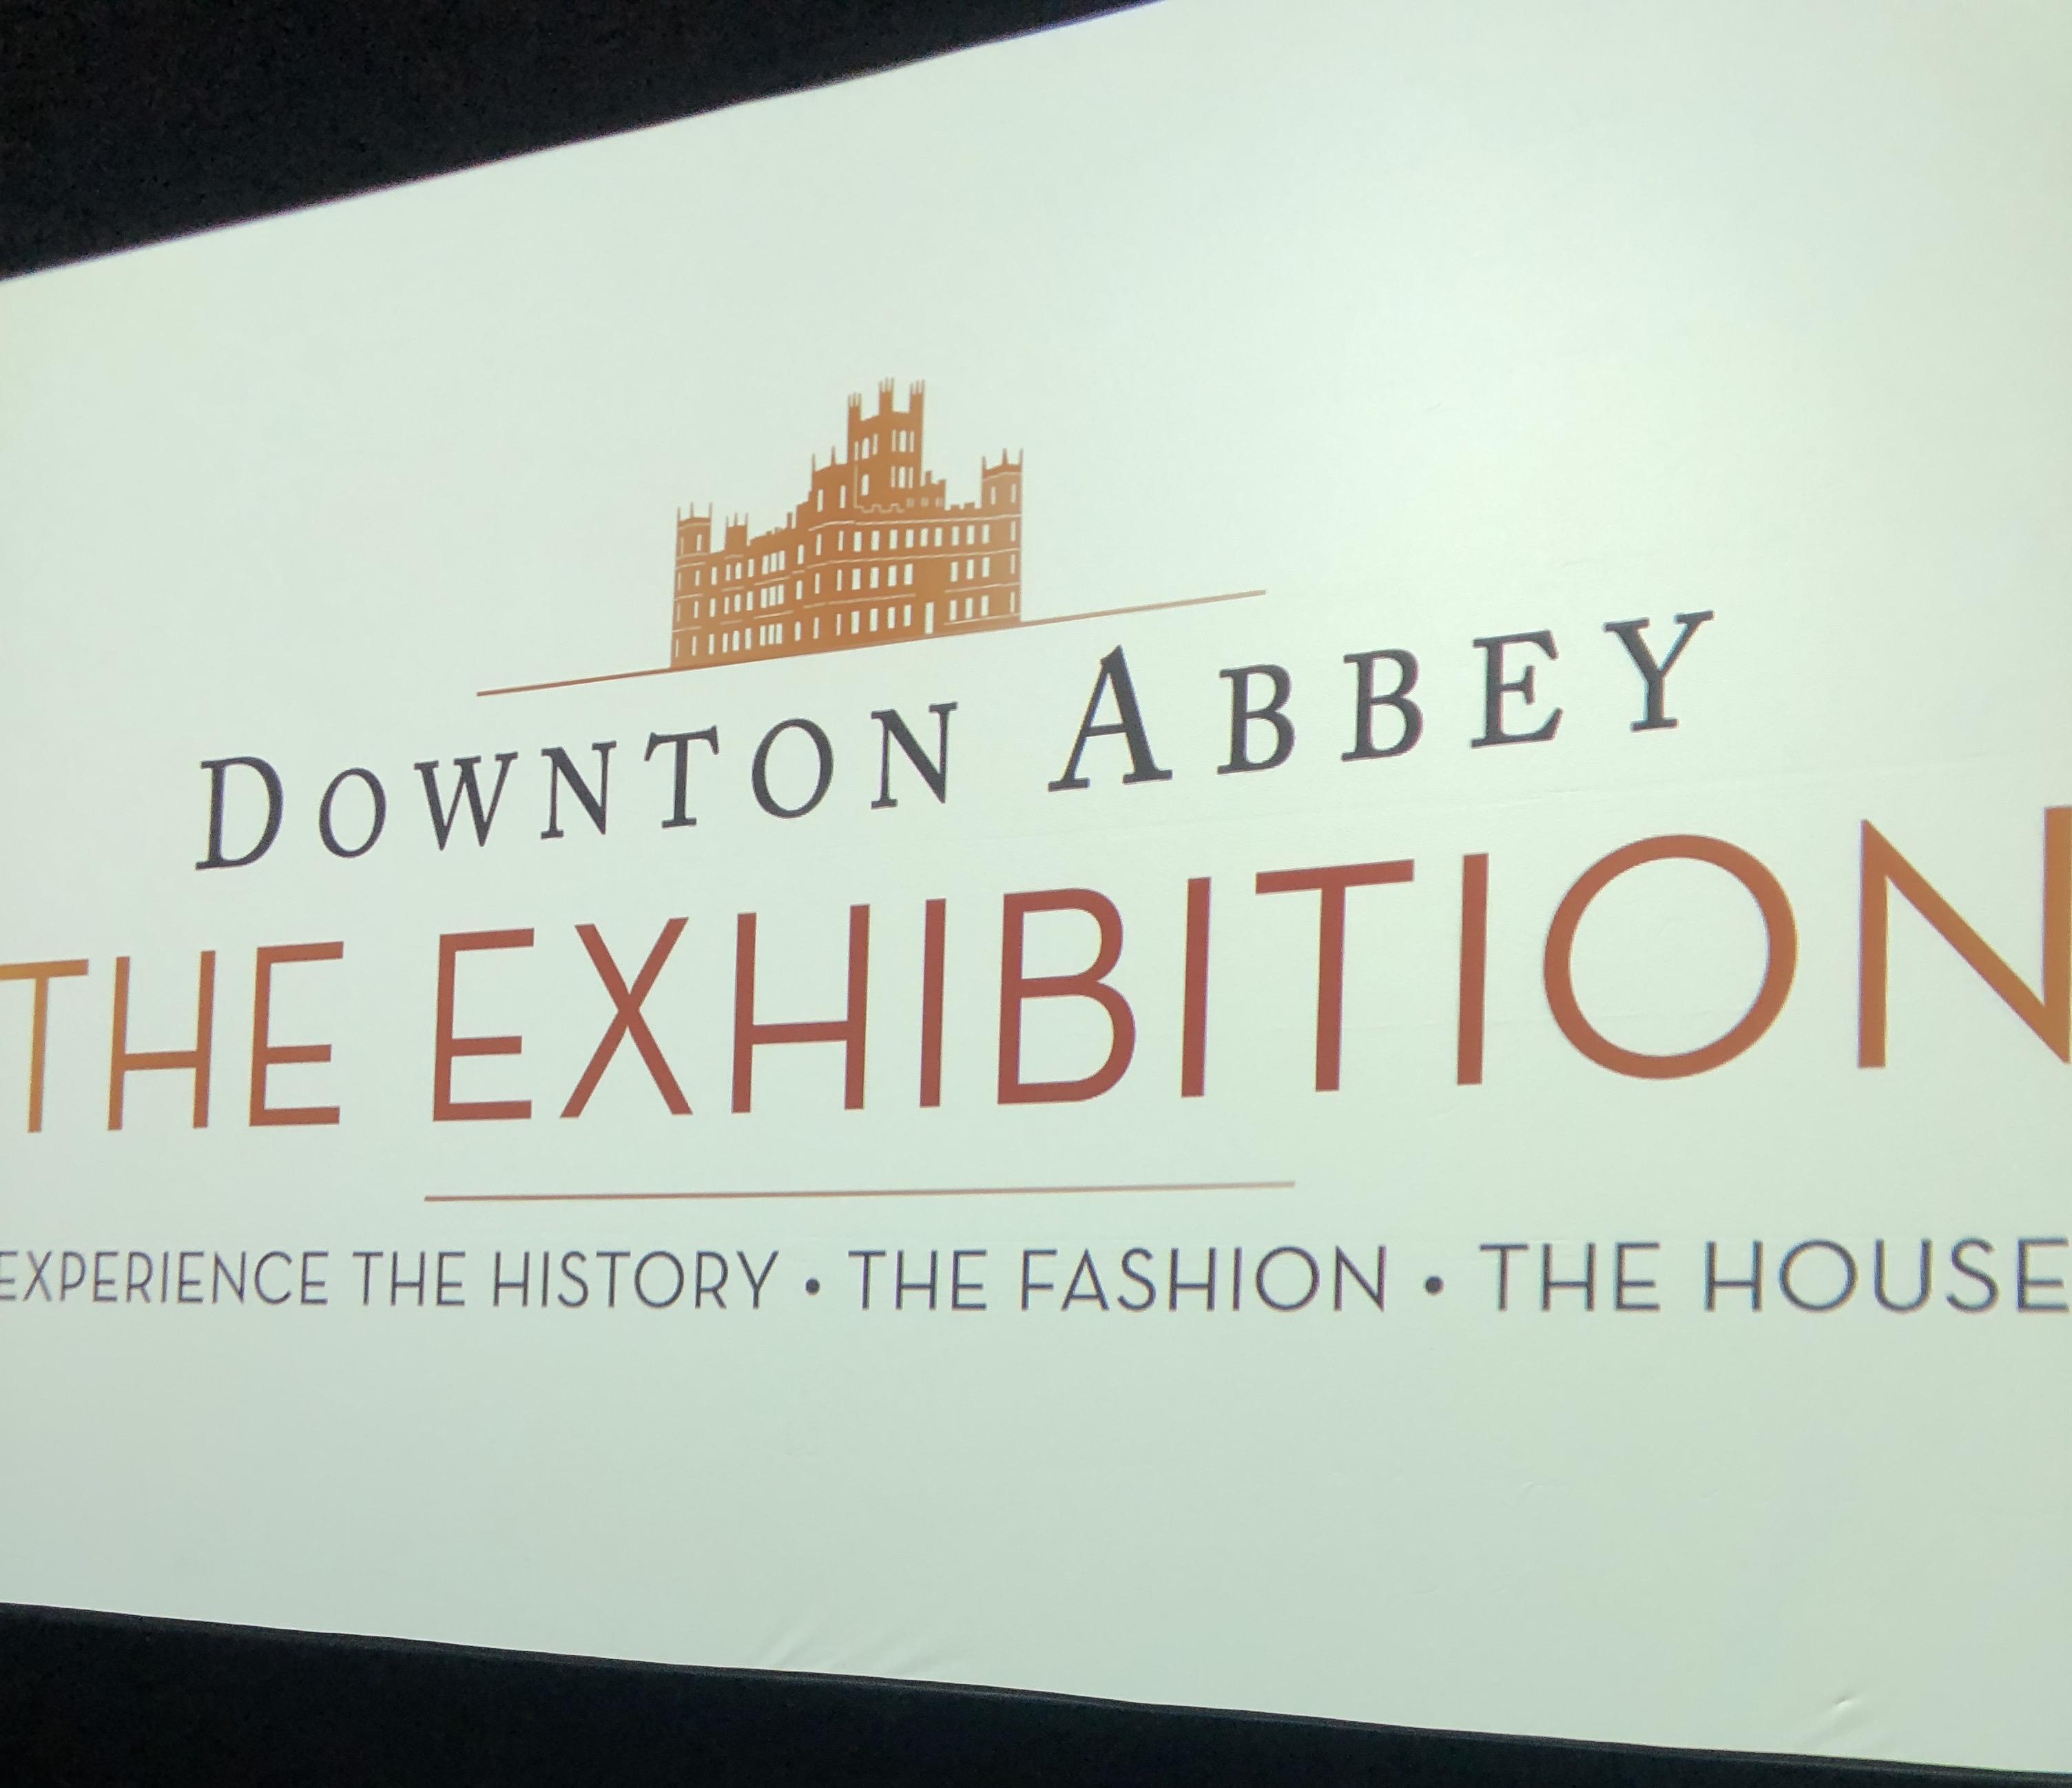 Downton Abbey Exhibition sign